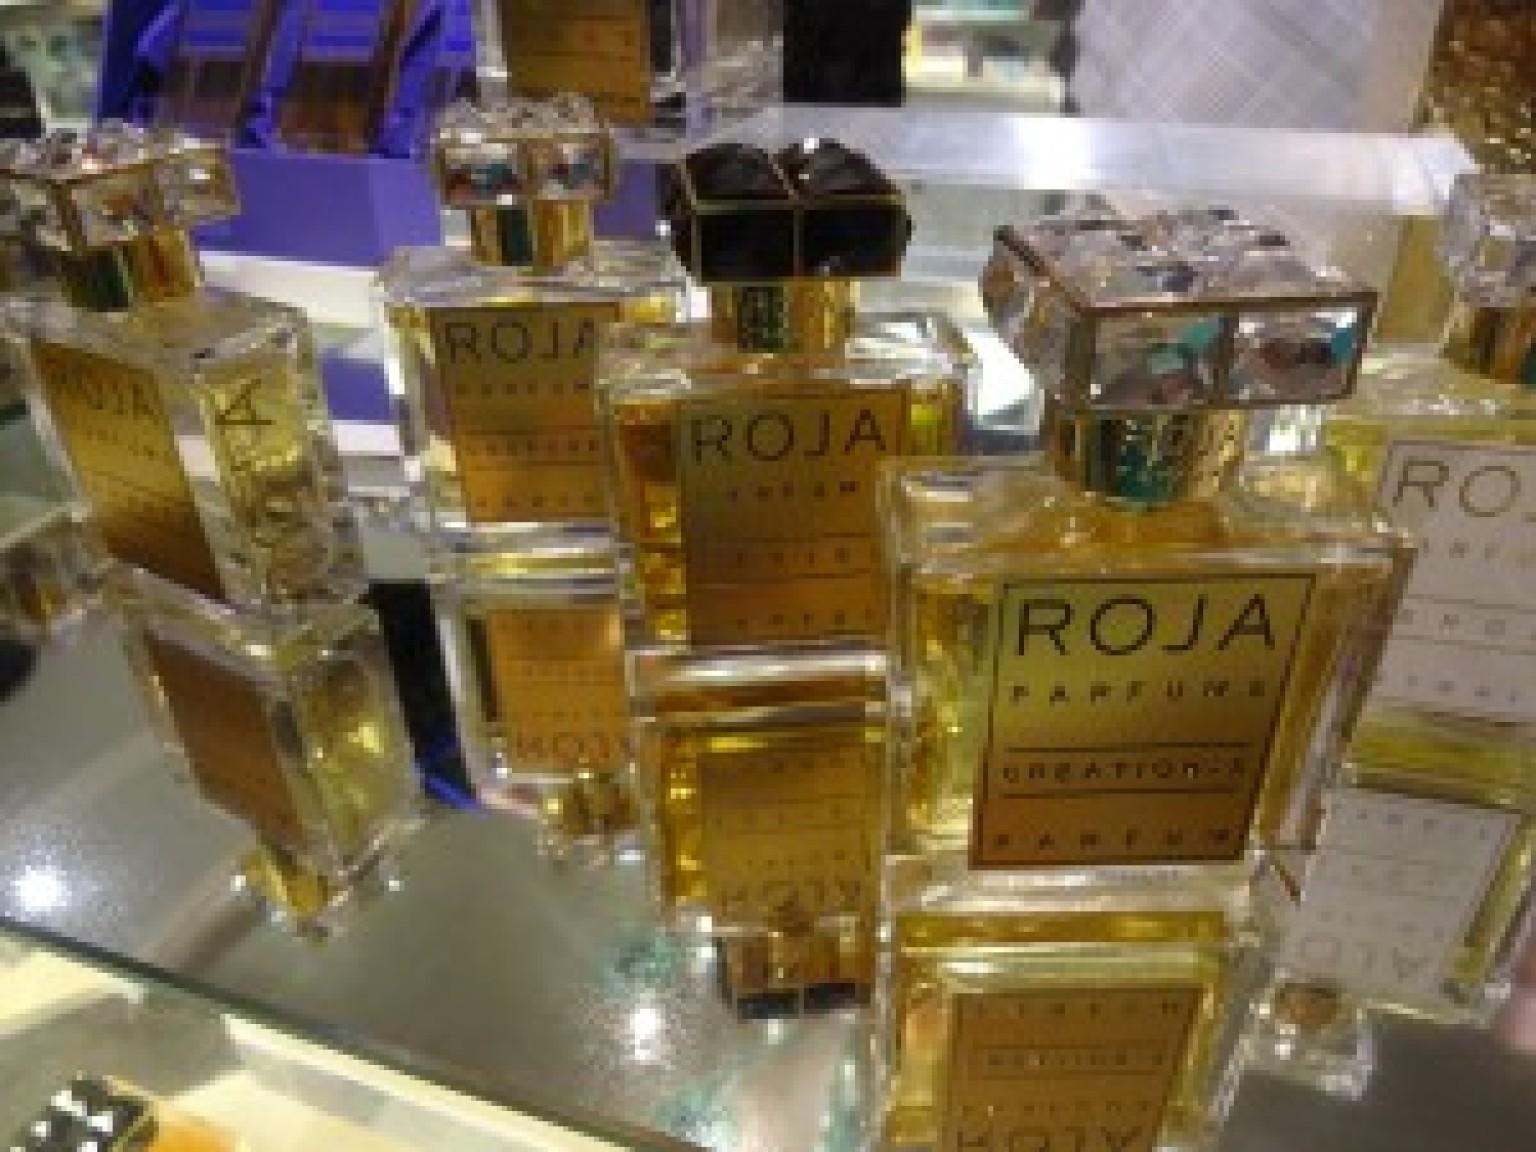 The Master Perfumer - Roja Dove | HuffPost